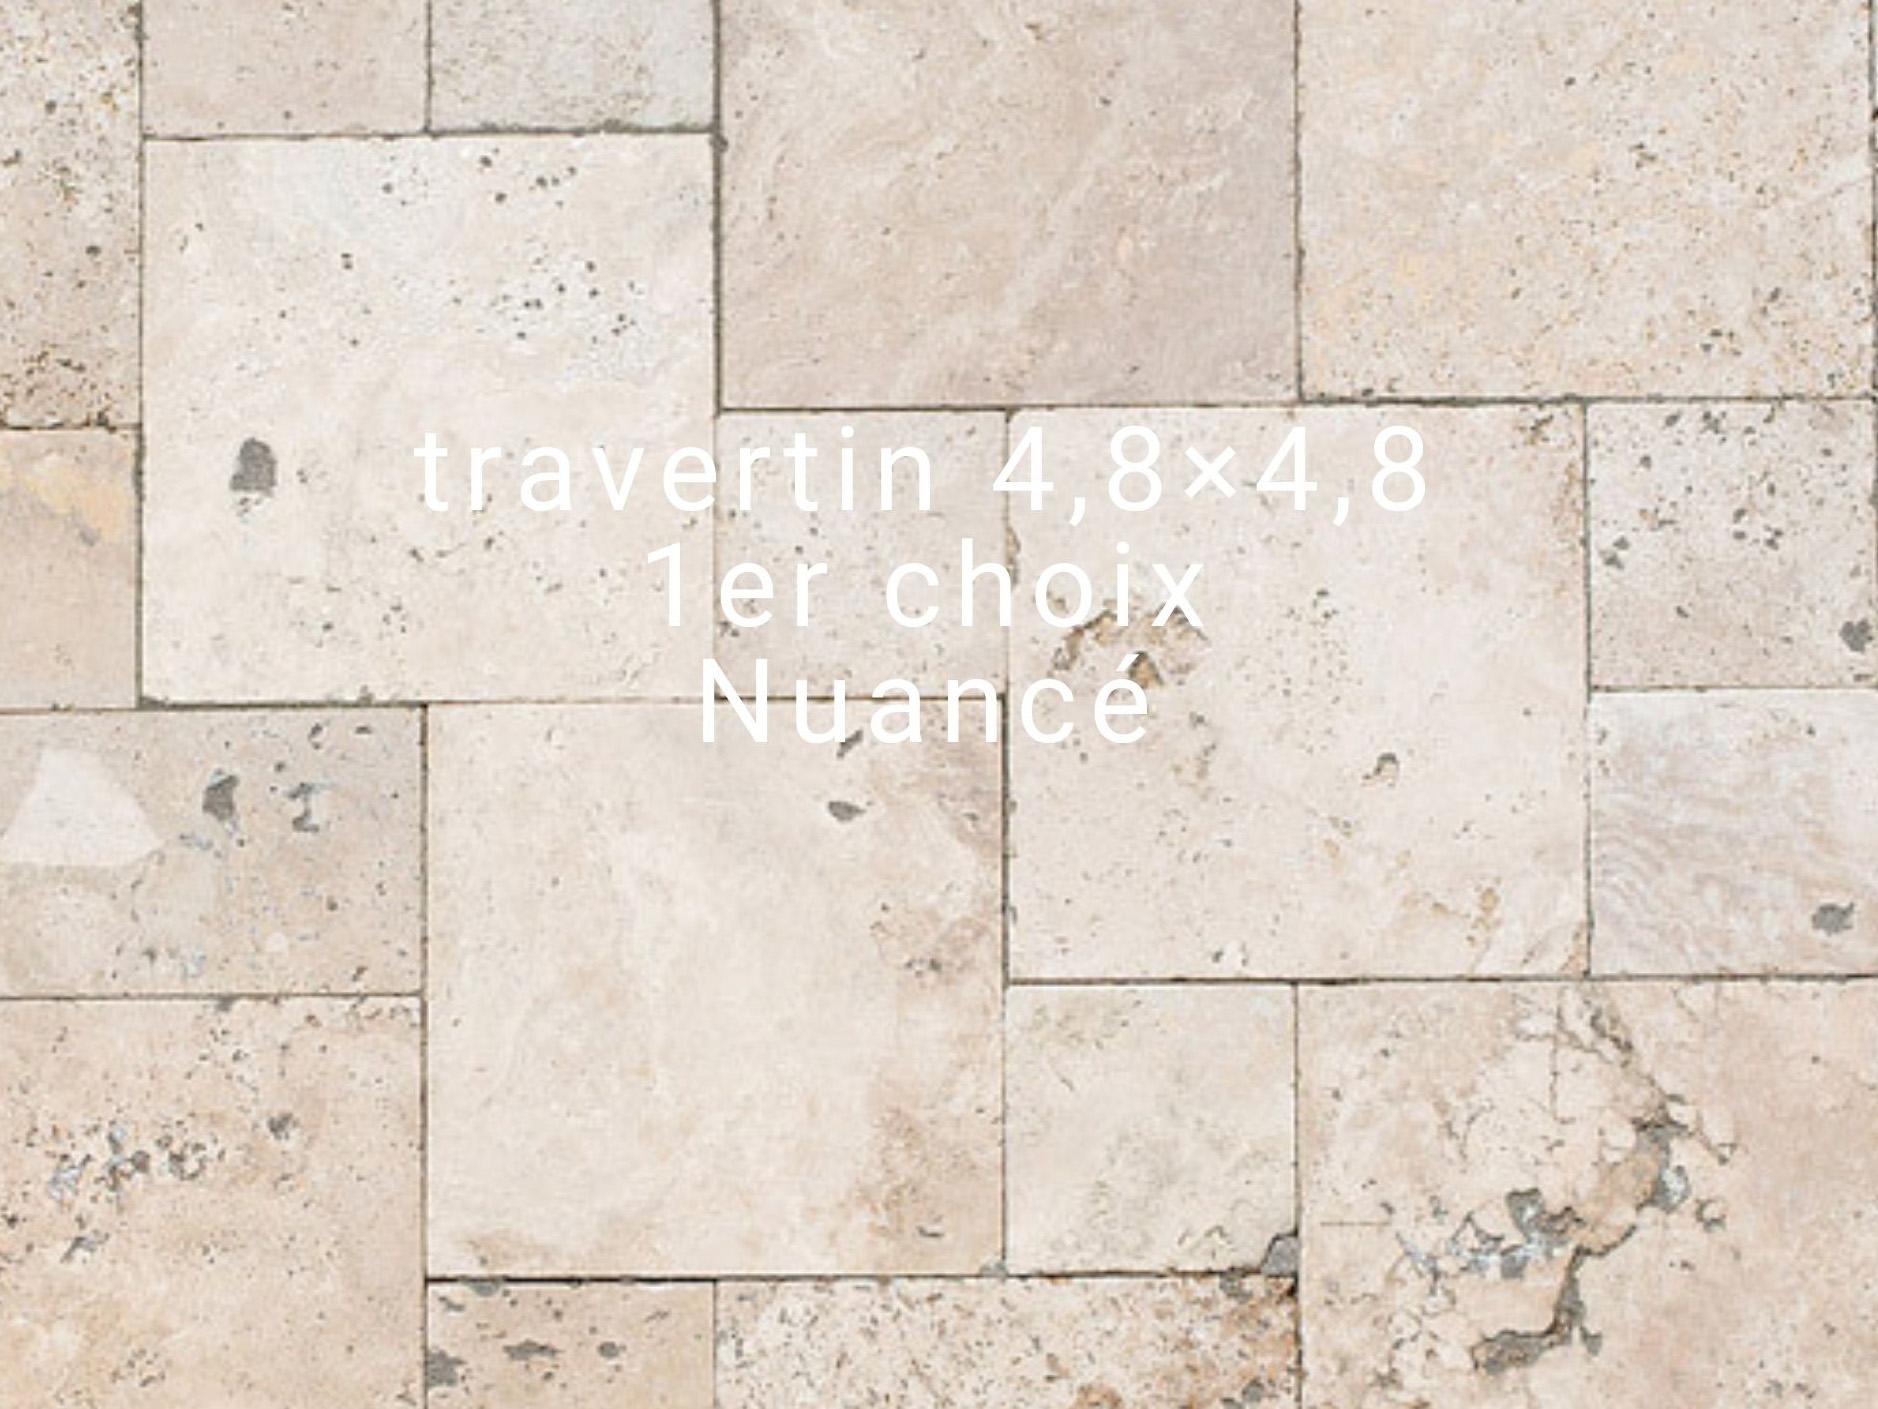 travertins apex pierre aix-en-provence